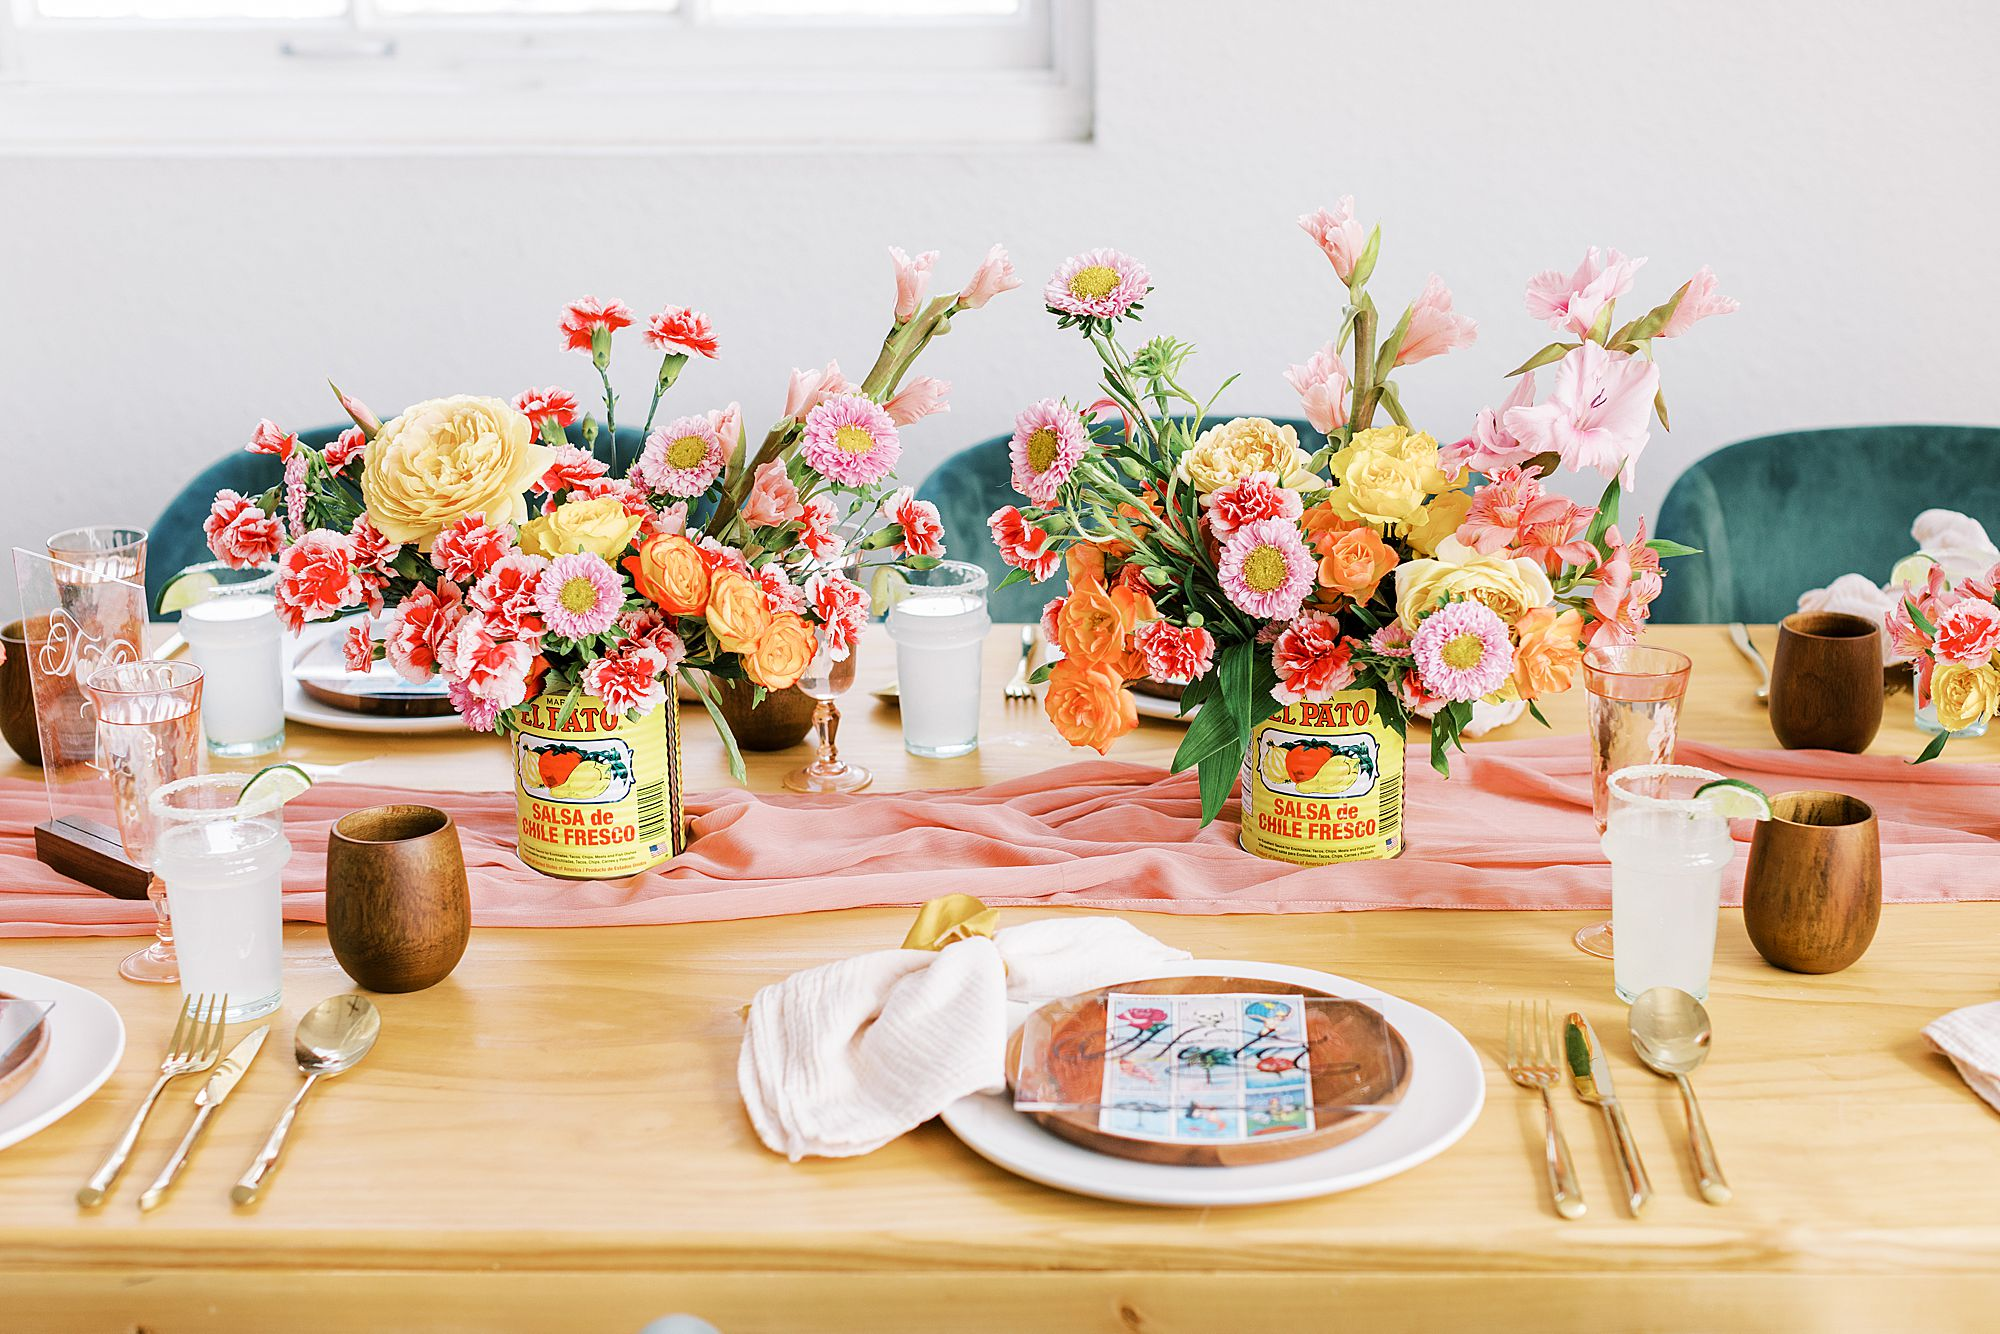 Cinco De Mayo Inspiration for Your FIesta - Party Crush Studio and Ashley Baumgartner_0029.jpg